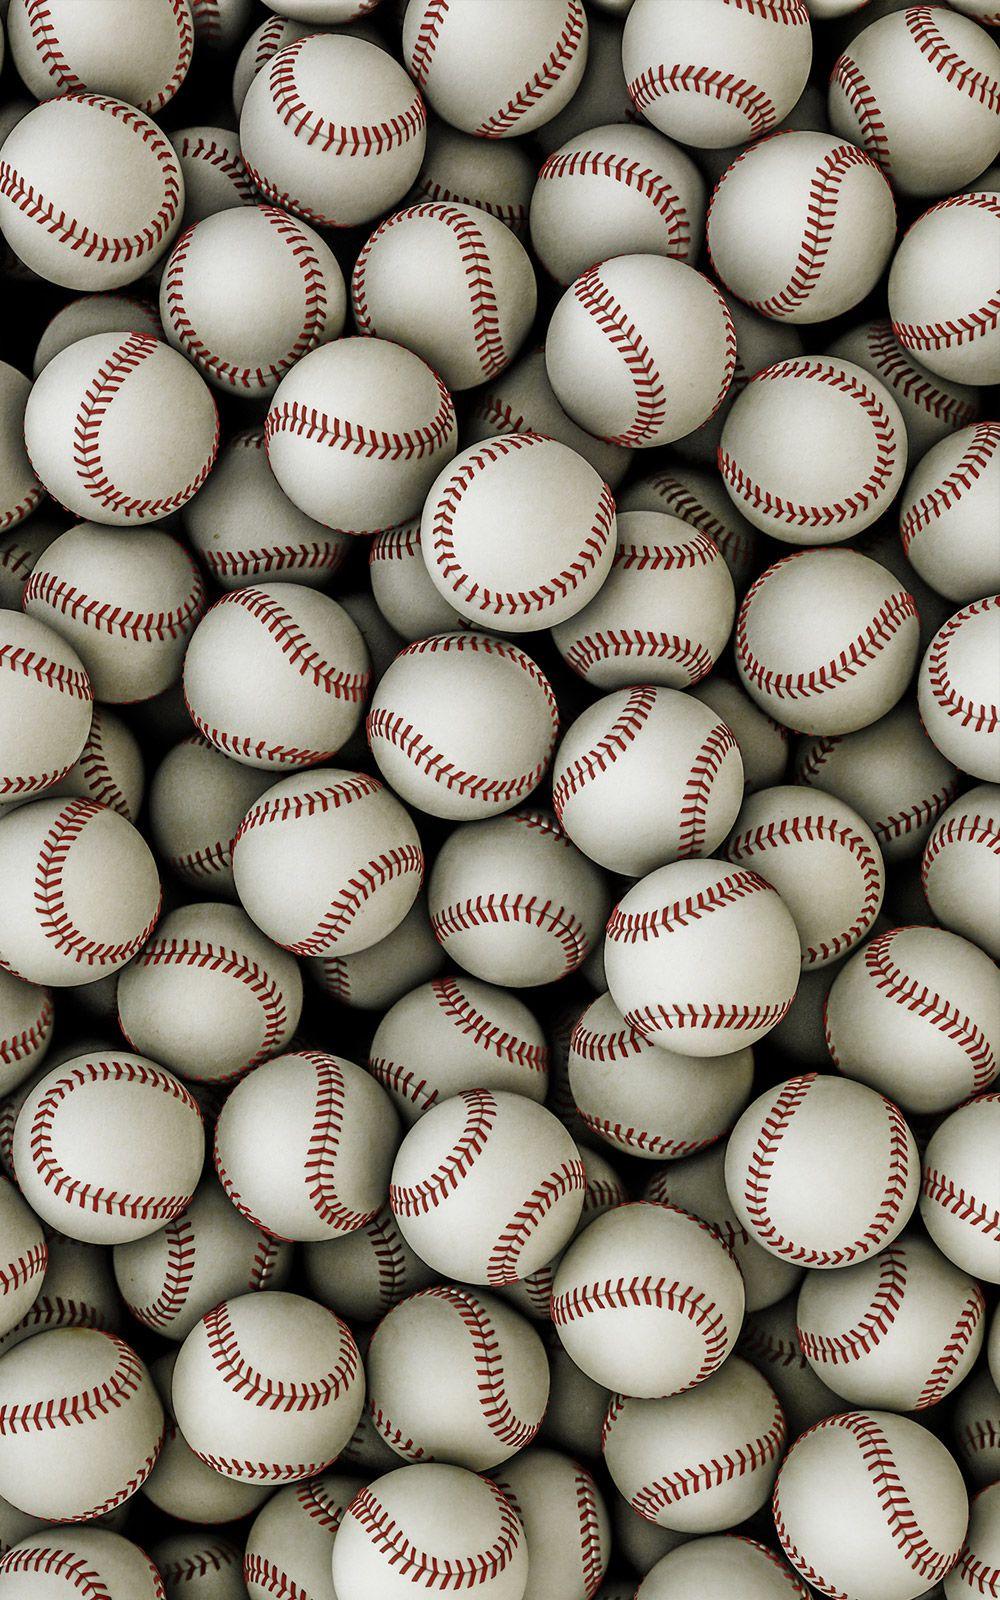 Baseball Wallpaper Hd High Definition Baseball Wallpaper Baseball Studio Background Images